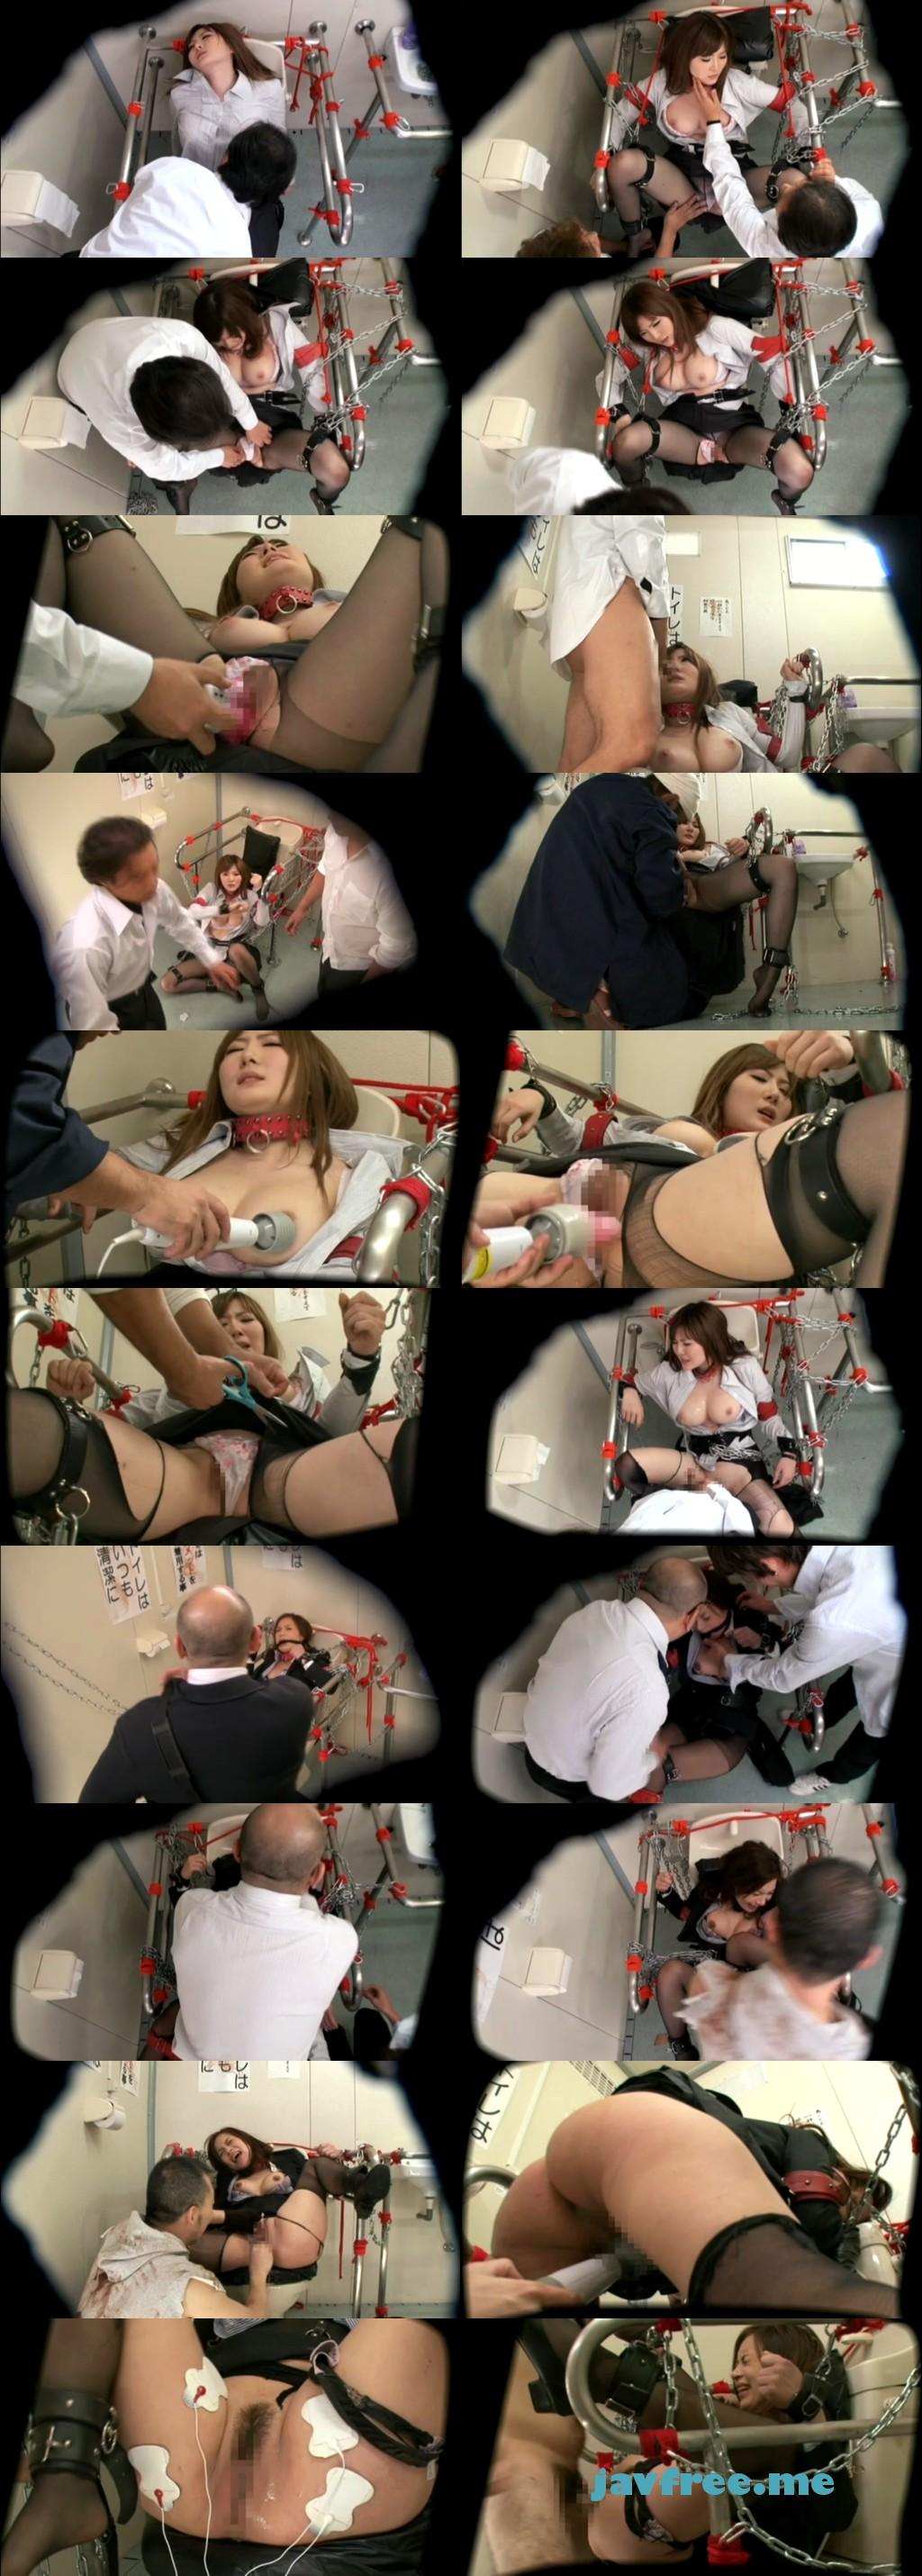 [SVDVD 278] 拷問 女教師中出し拘束肉便器 仁科百華 RISA 仁科百華 SVDVD risa